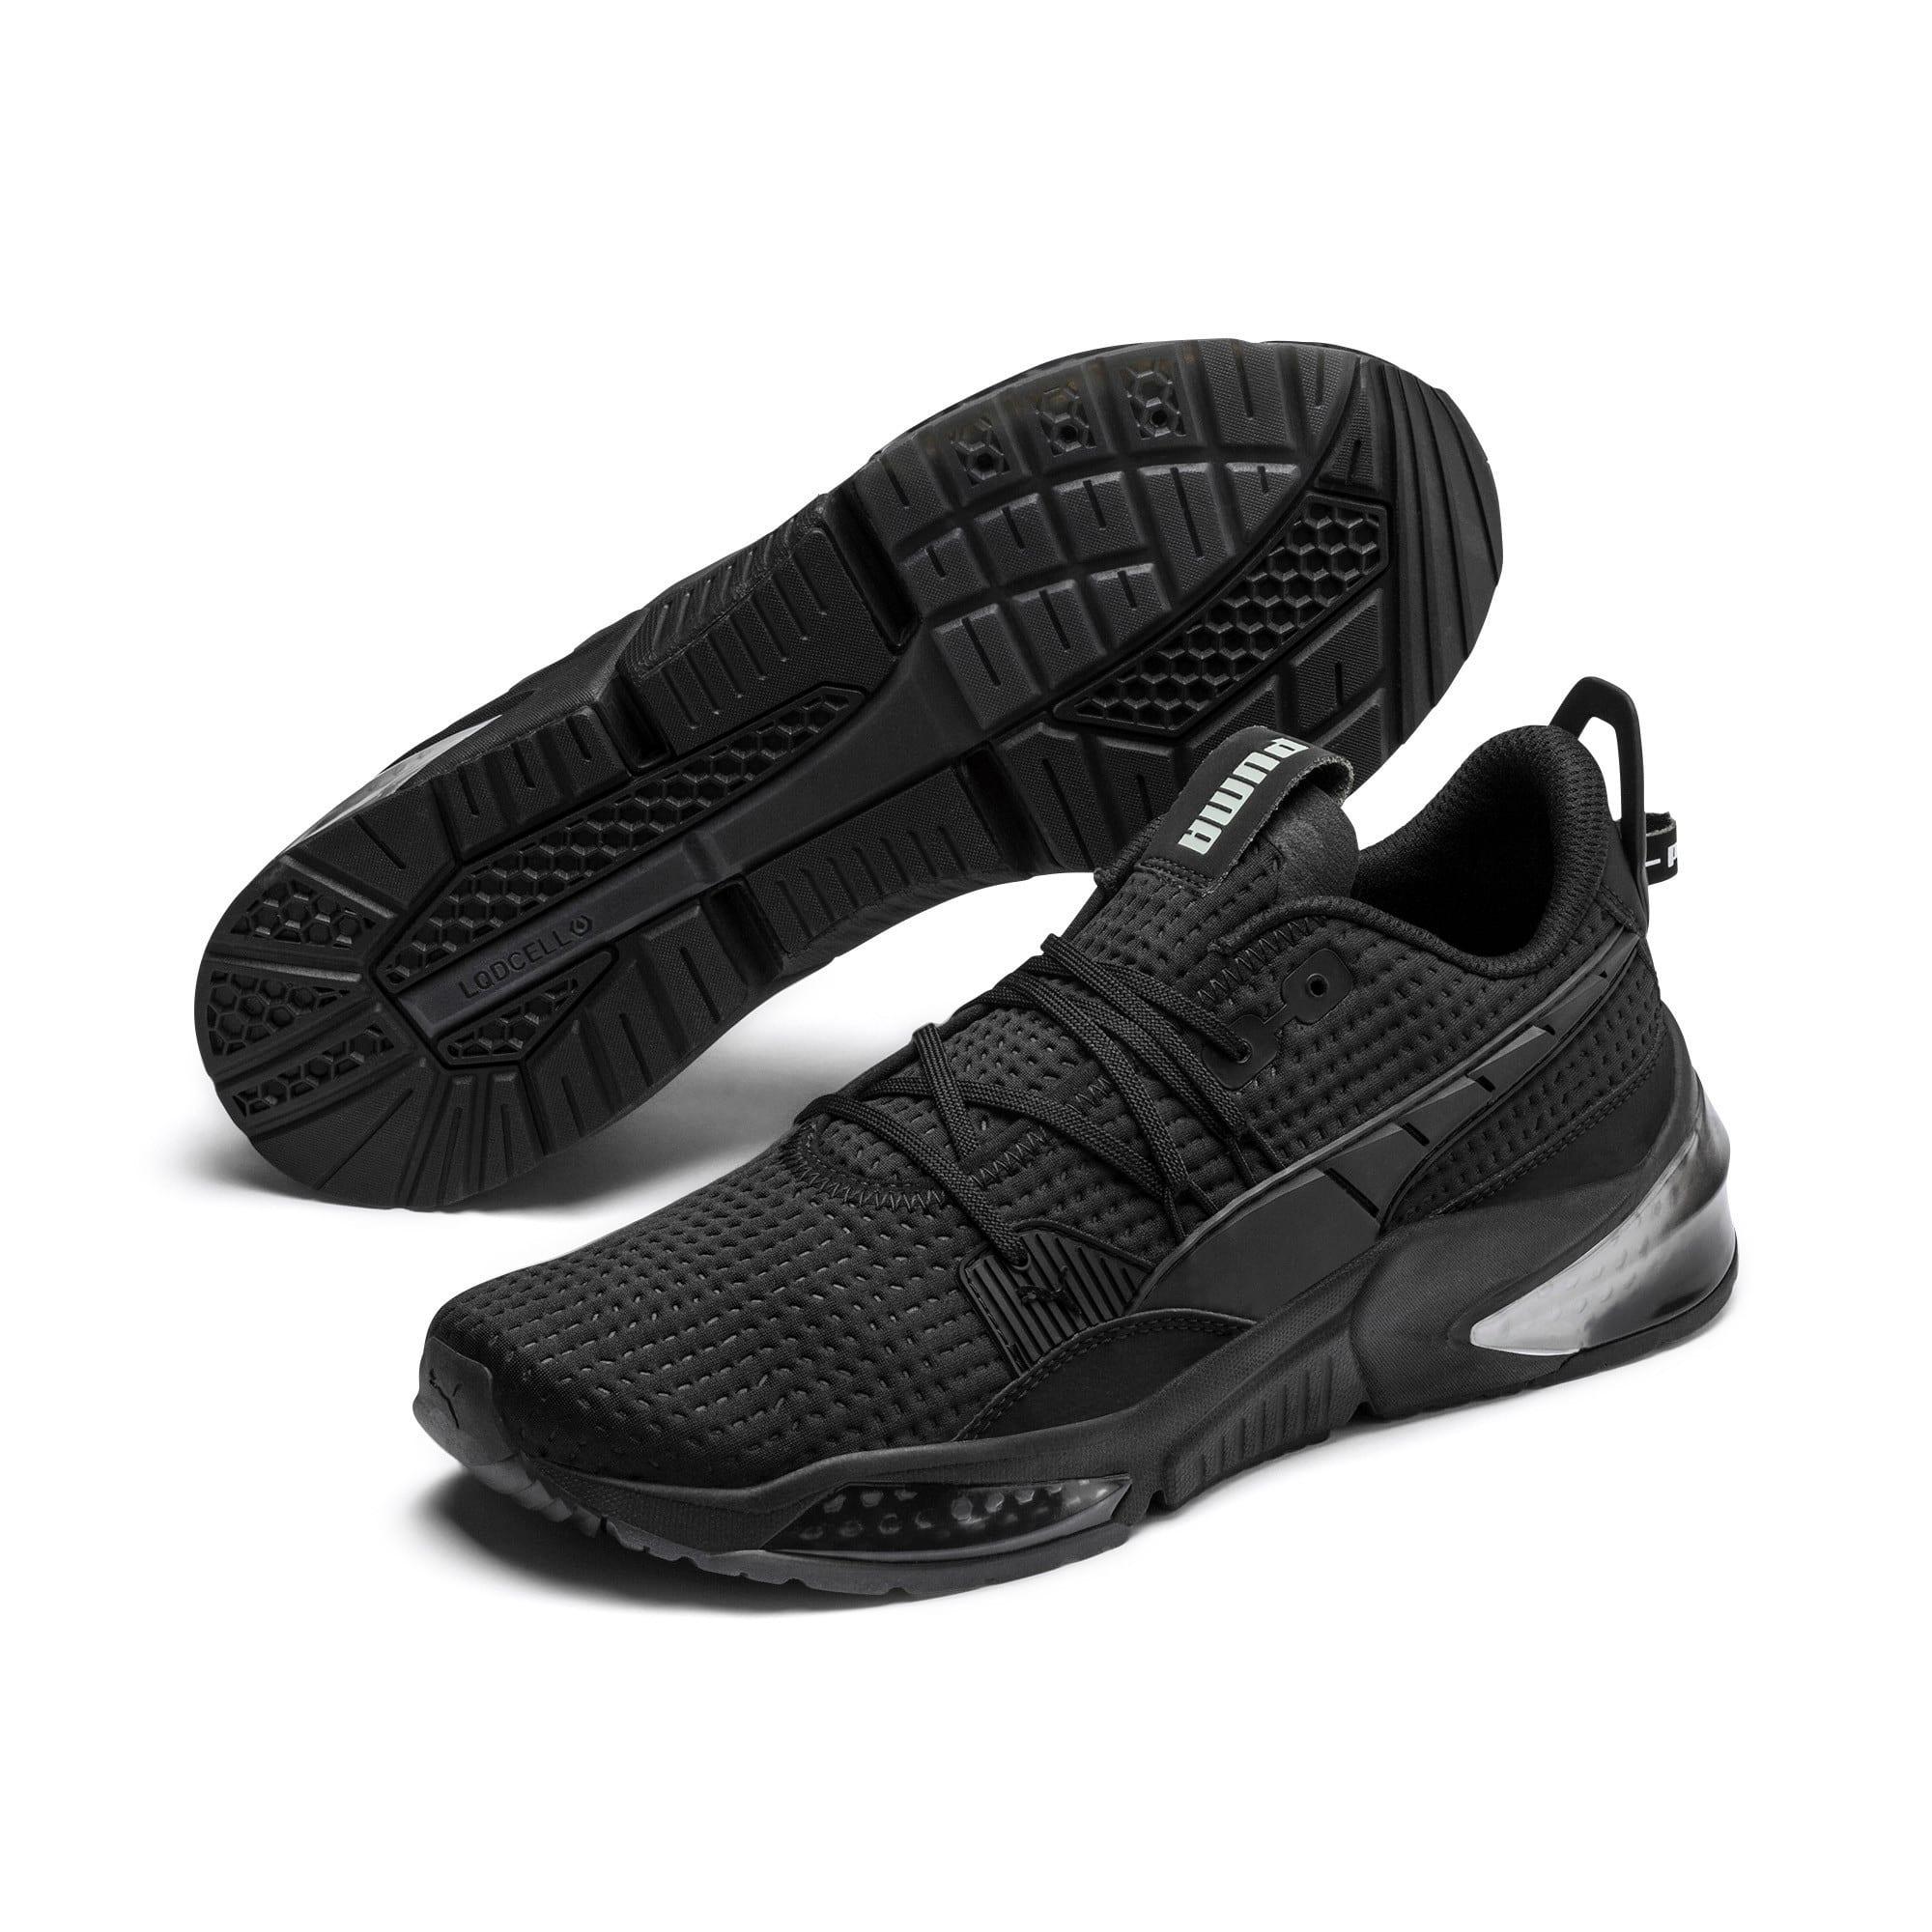 Thumbnail 8 of LQDCELL Optic Flight Suit Men's Running Shoes, Puma Black, medium-IND